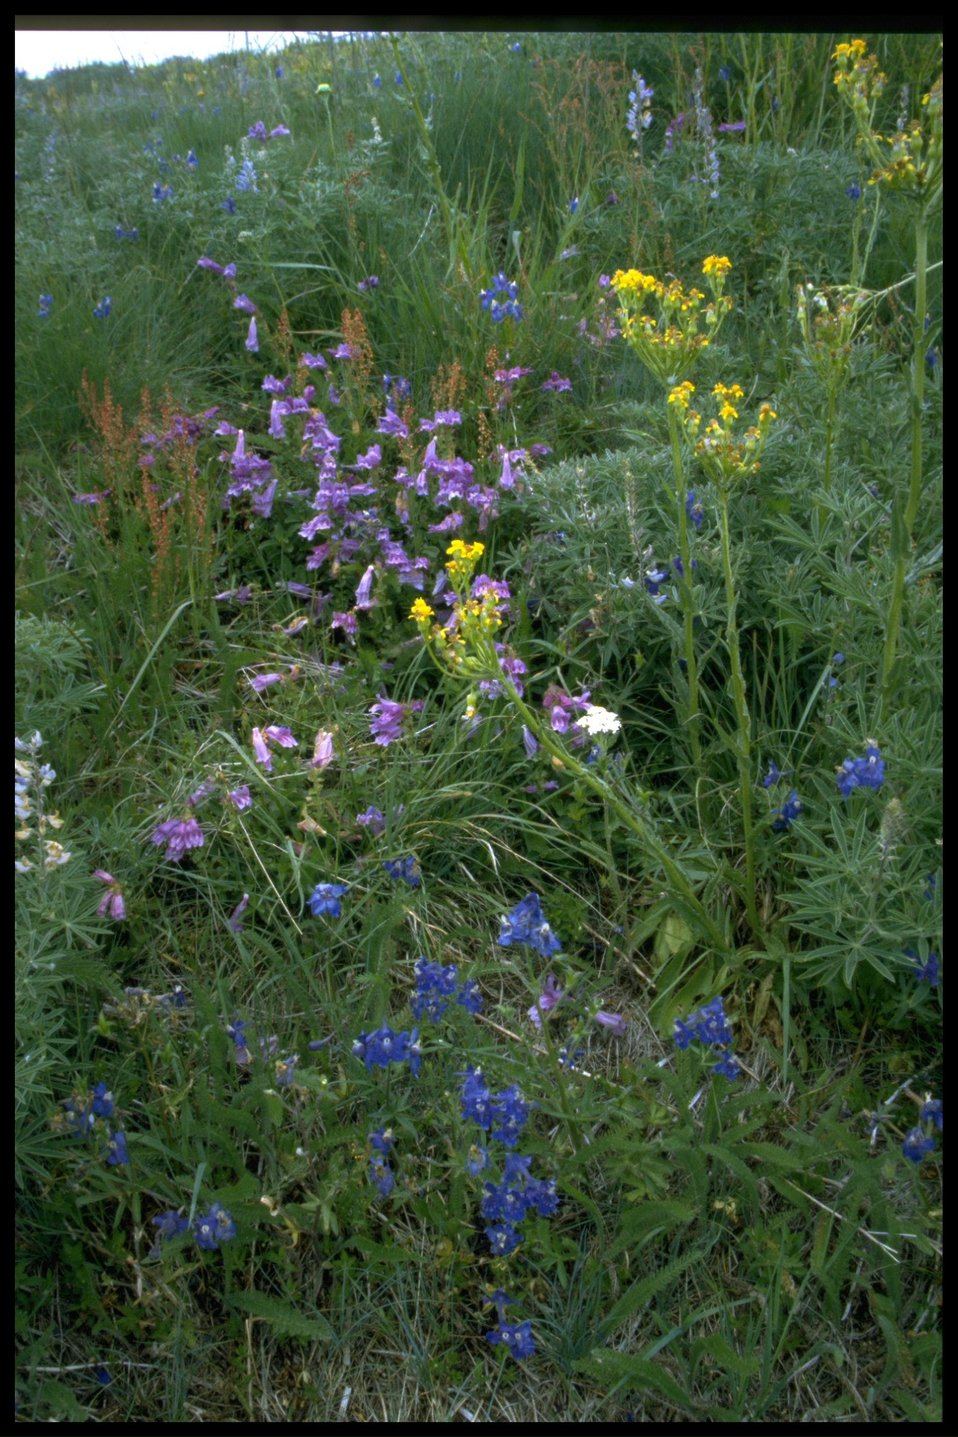 Medium shot of wildflowers (genus Lupinus, Penstemon, Senecio).